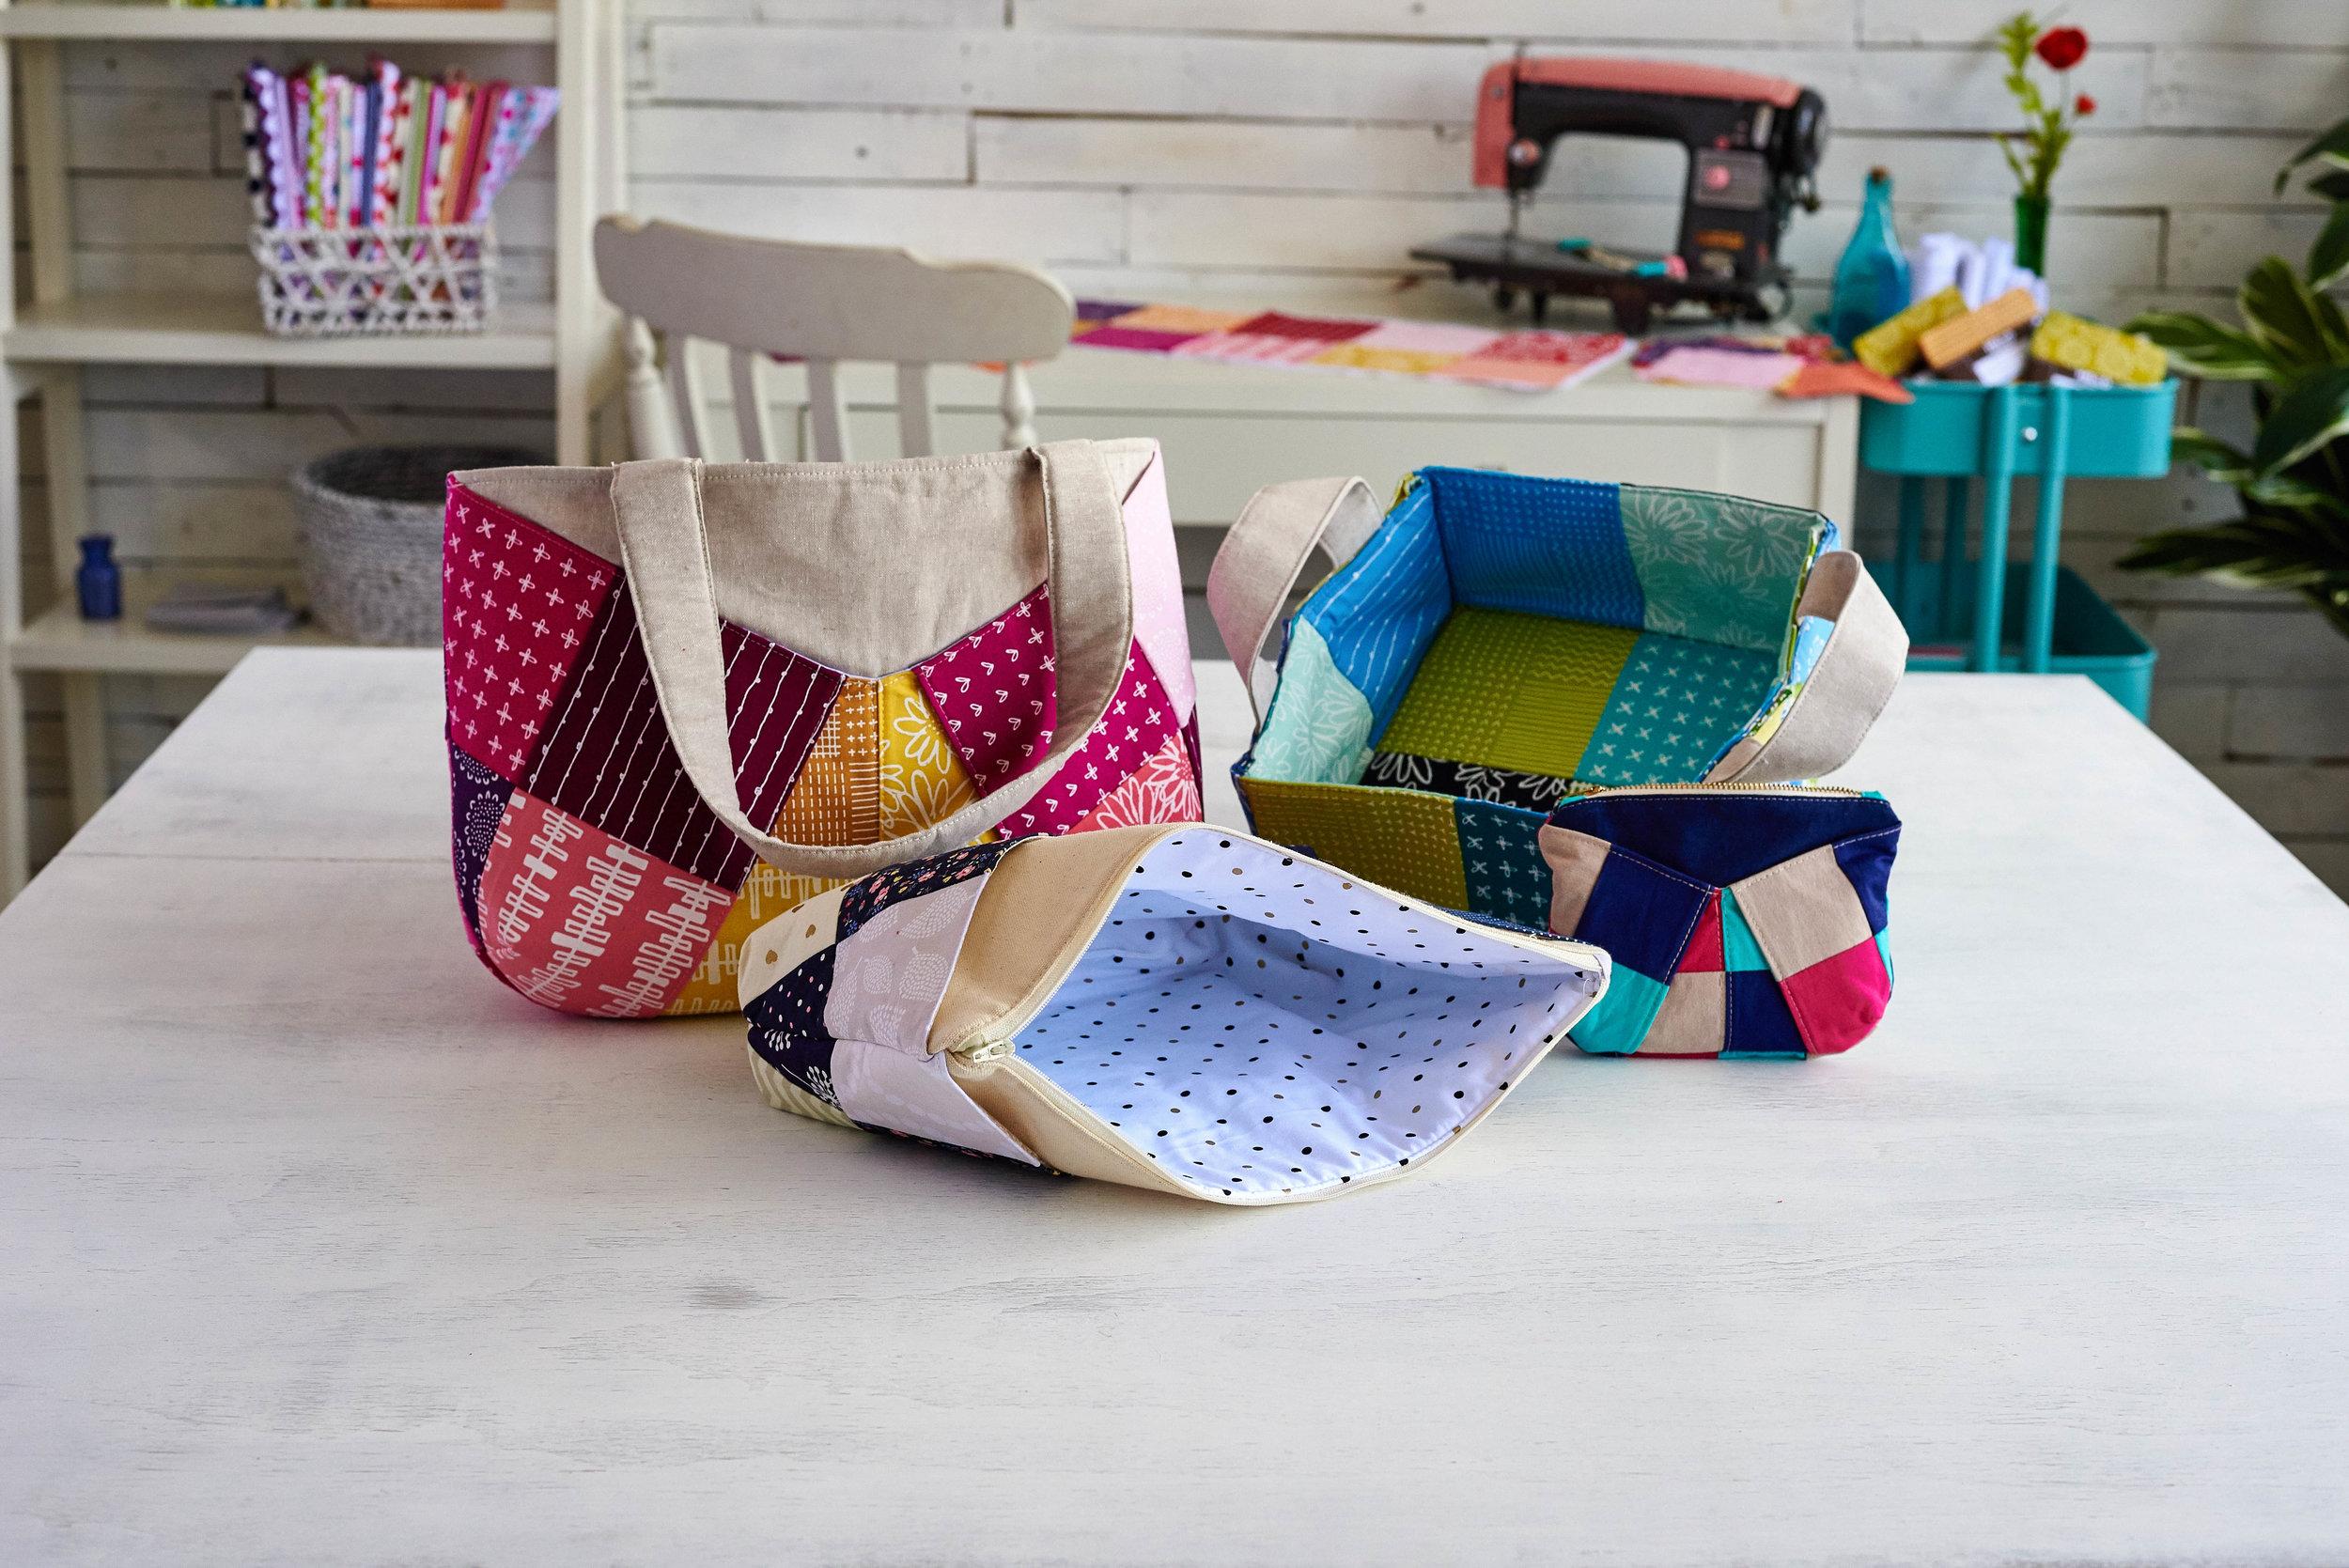 -10637_CB_Colorful Patchwork Baskets & Bags_Caroline Fairbanks-Critchfield13337_retouched.jpg